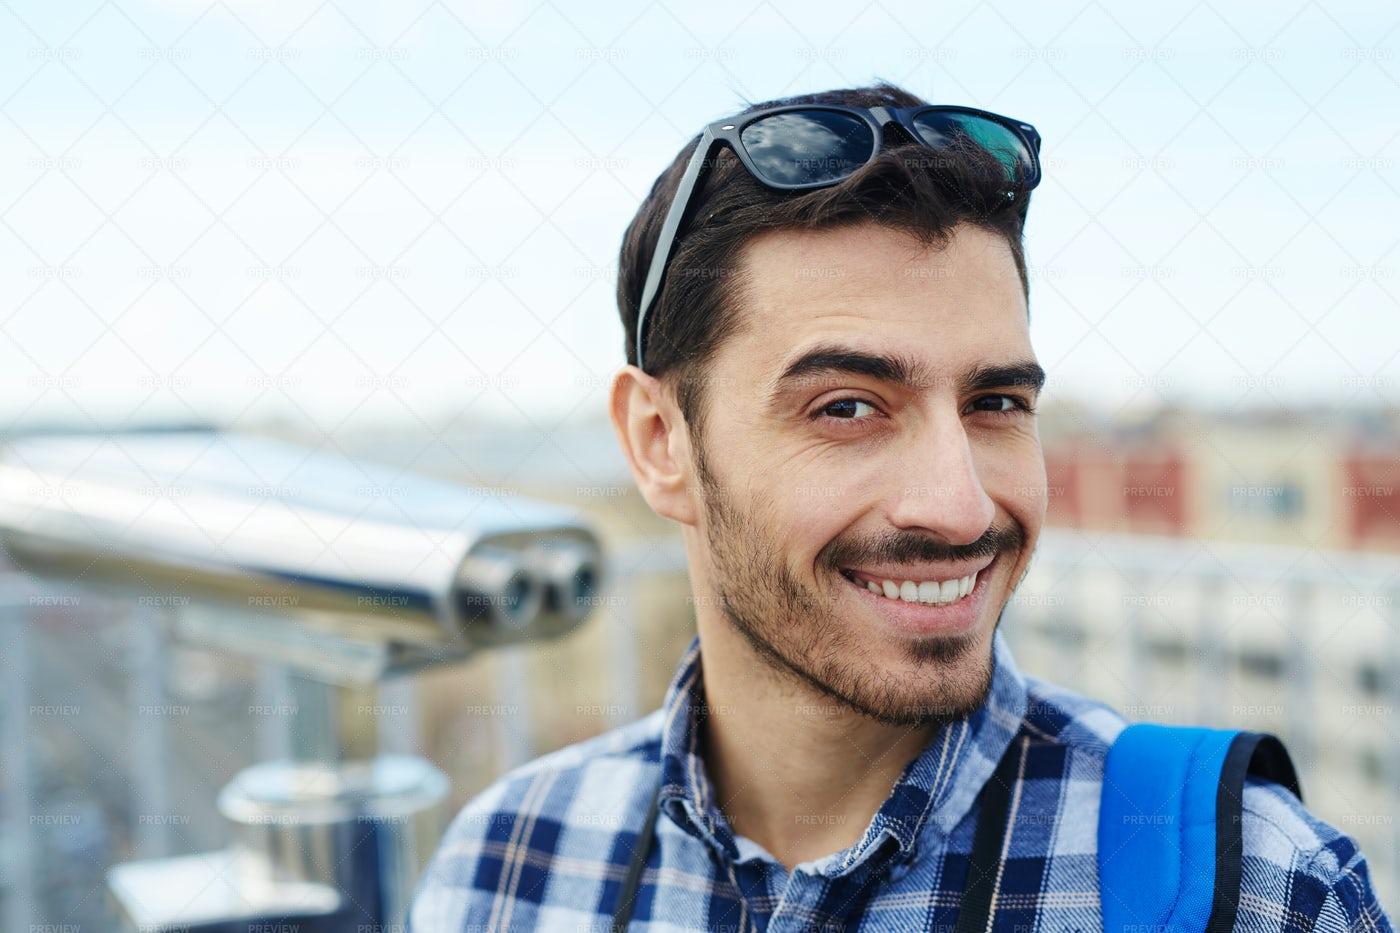 Smiling Tourist Enjoying Vacation Trip: Stock Photos